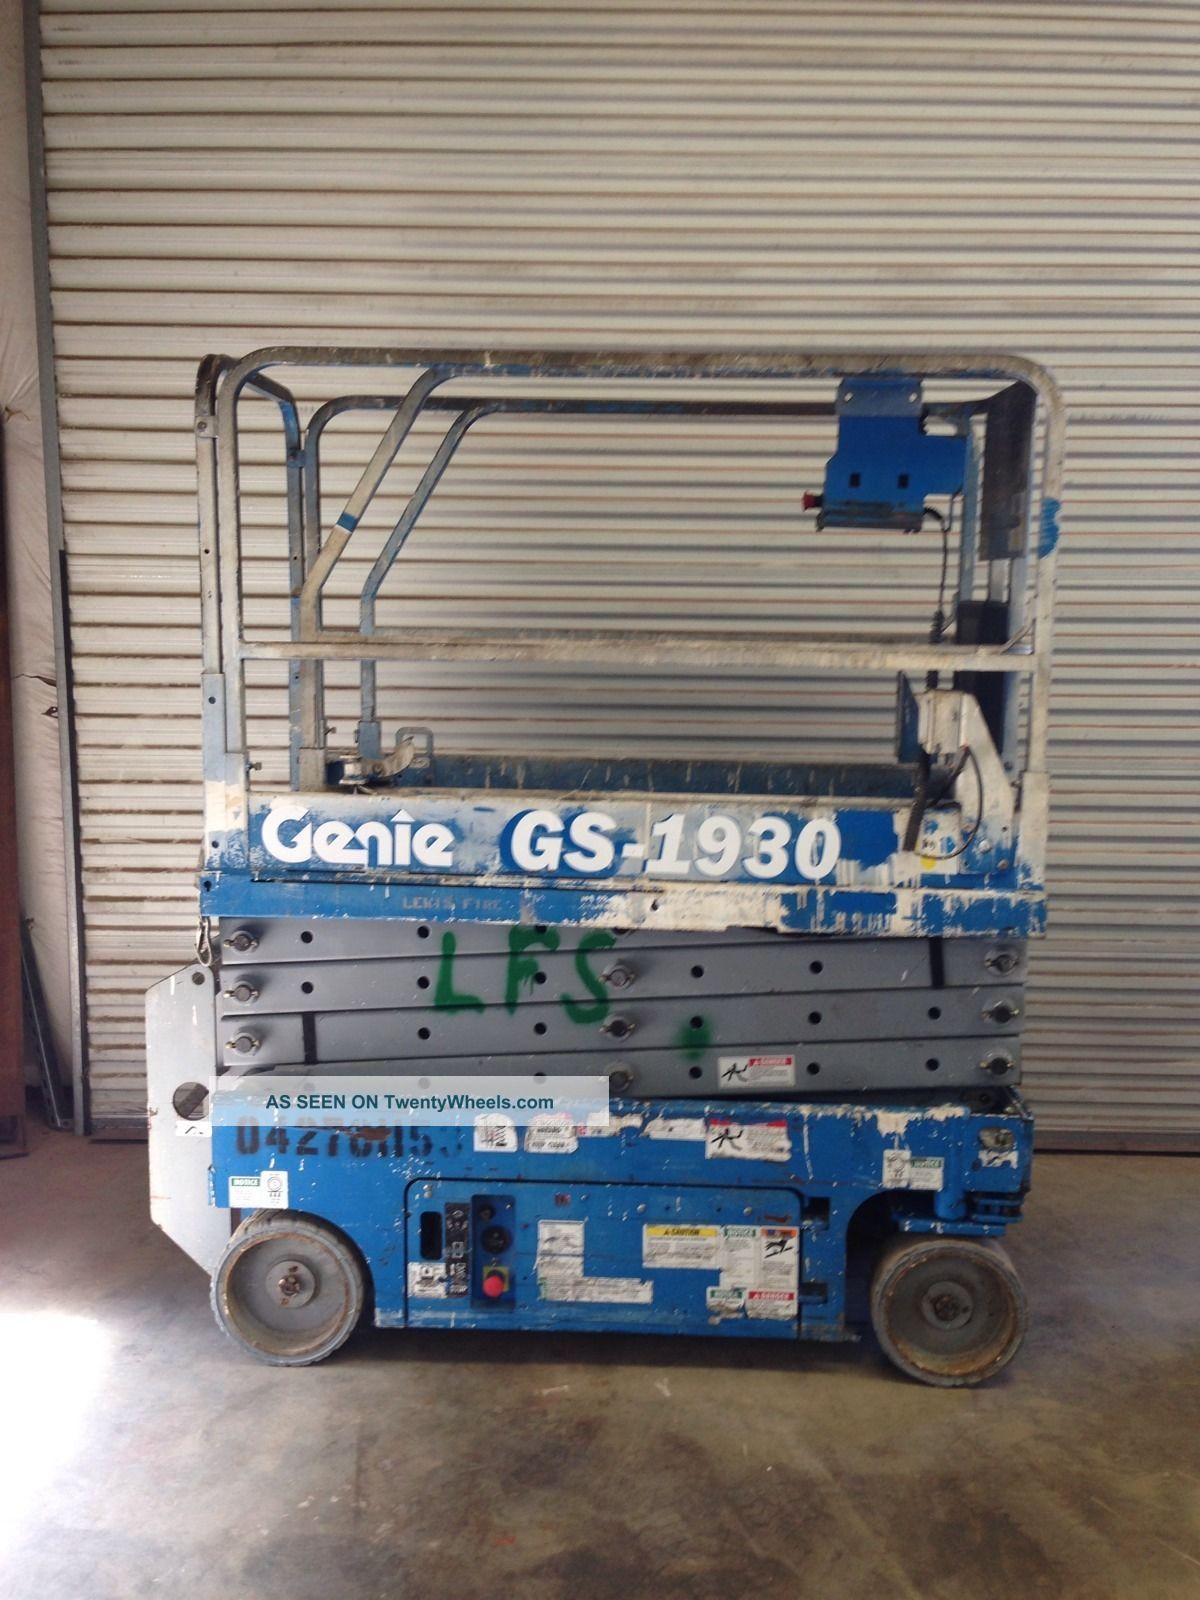 2005 Genie Gs 1930 Scissor Lift Skyjack Jlg Aerial Boom Forklift Wiring Diagram For